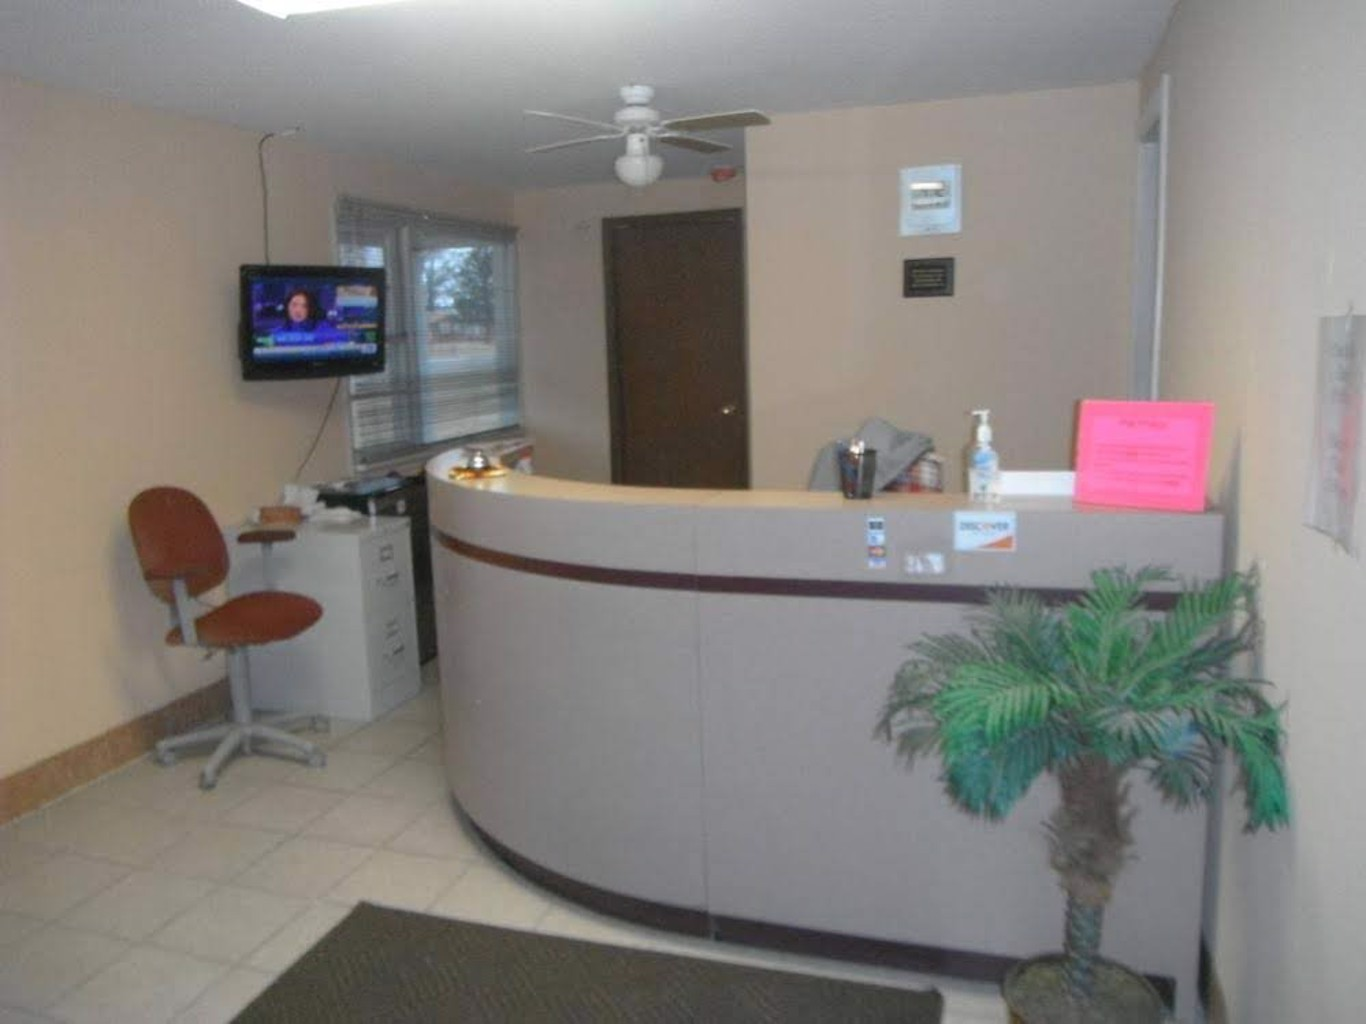 Gallery image of Red Carpet Inn